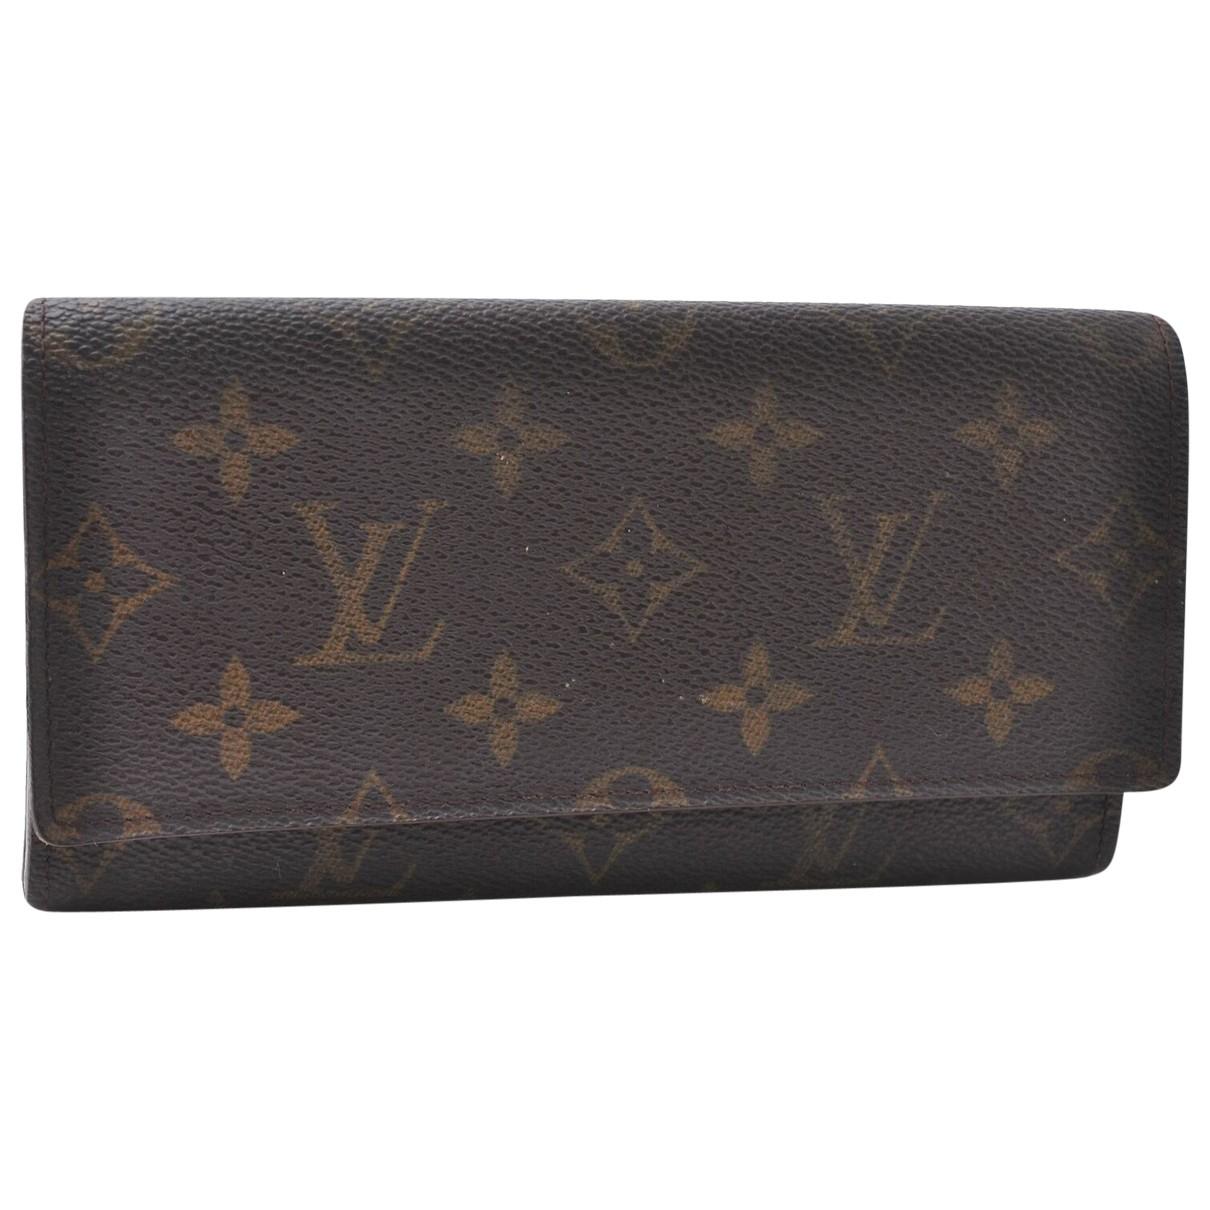 Louis Vuitton N Brown Cloth wallet for Women N